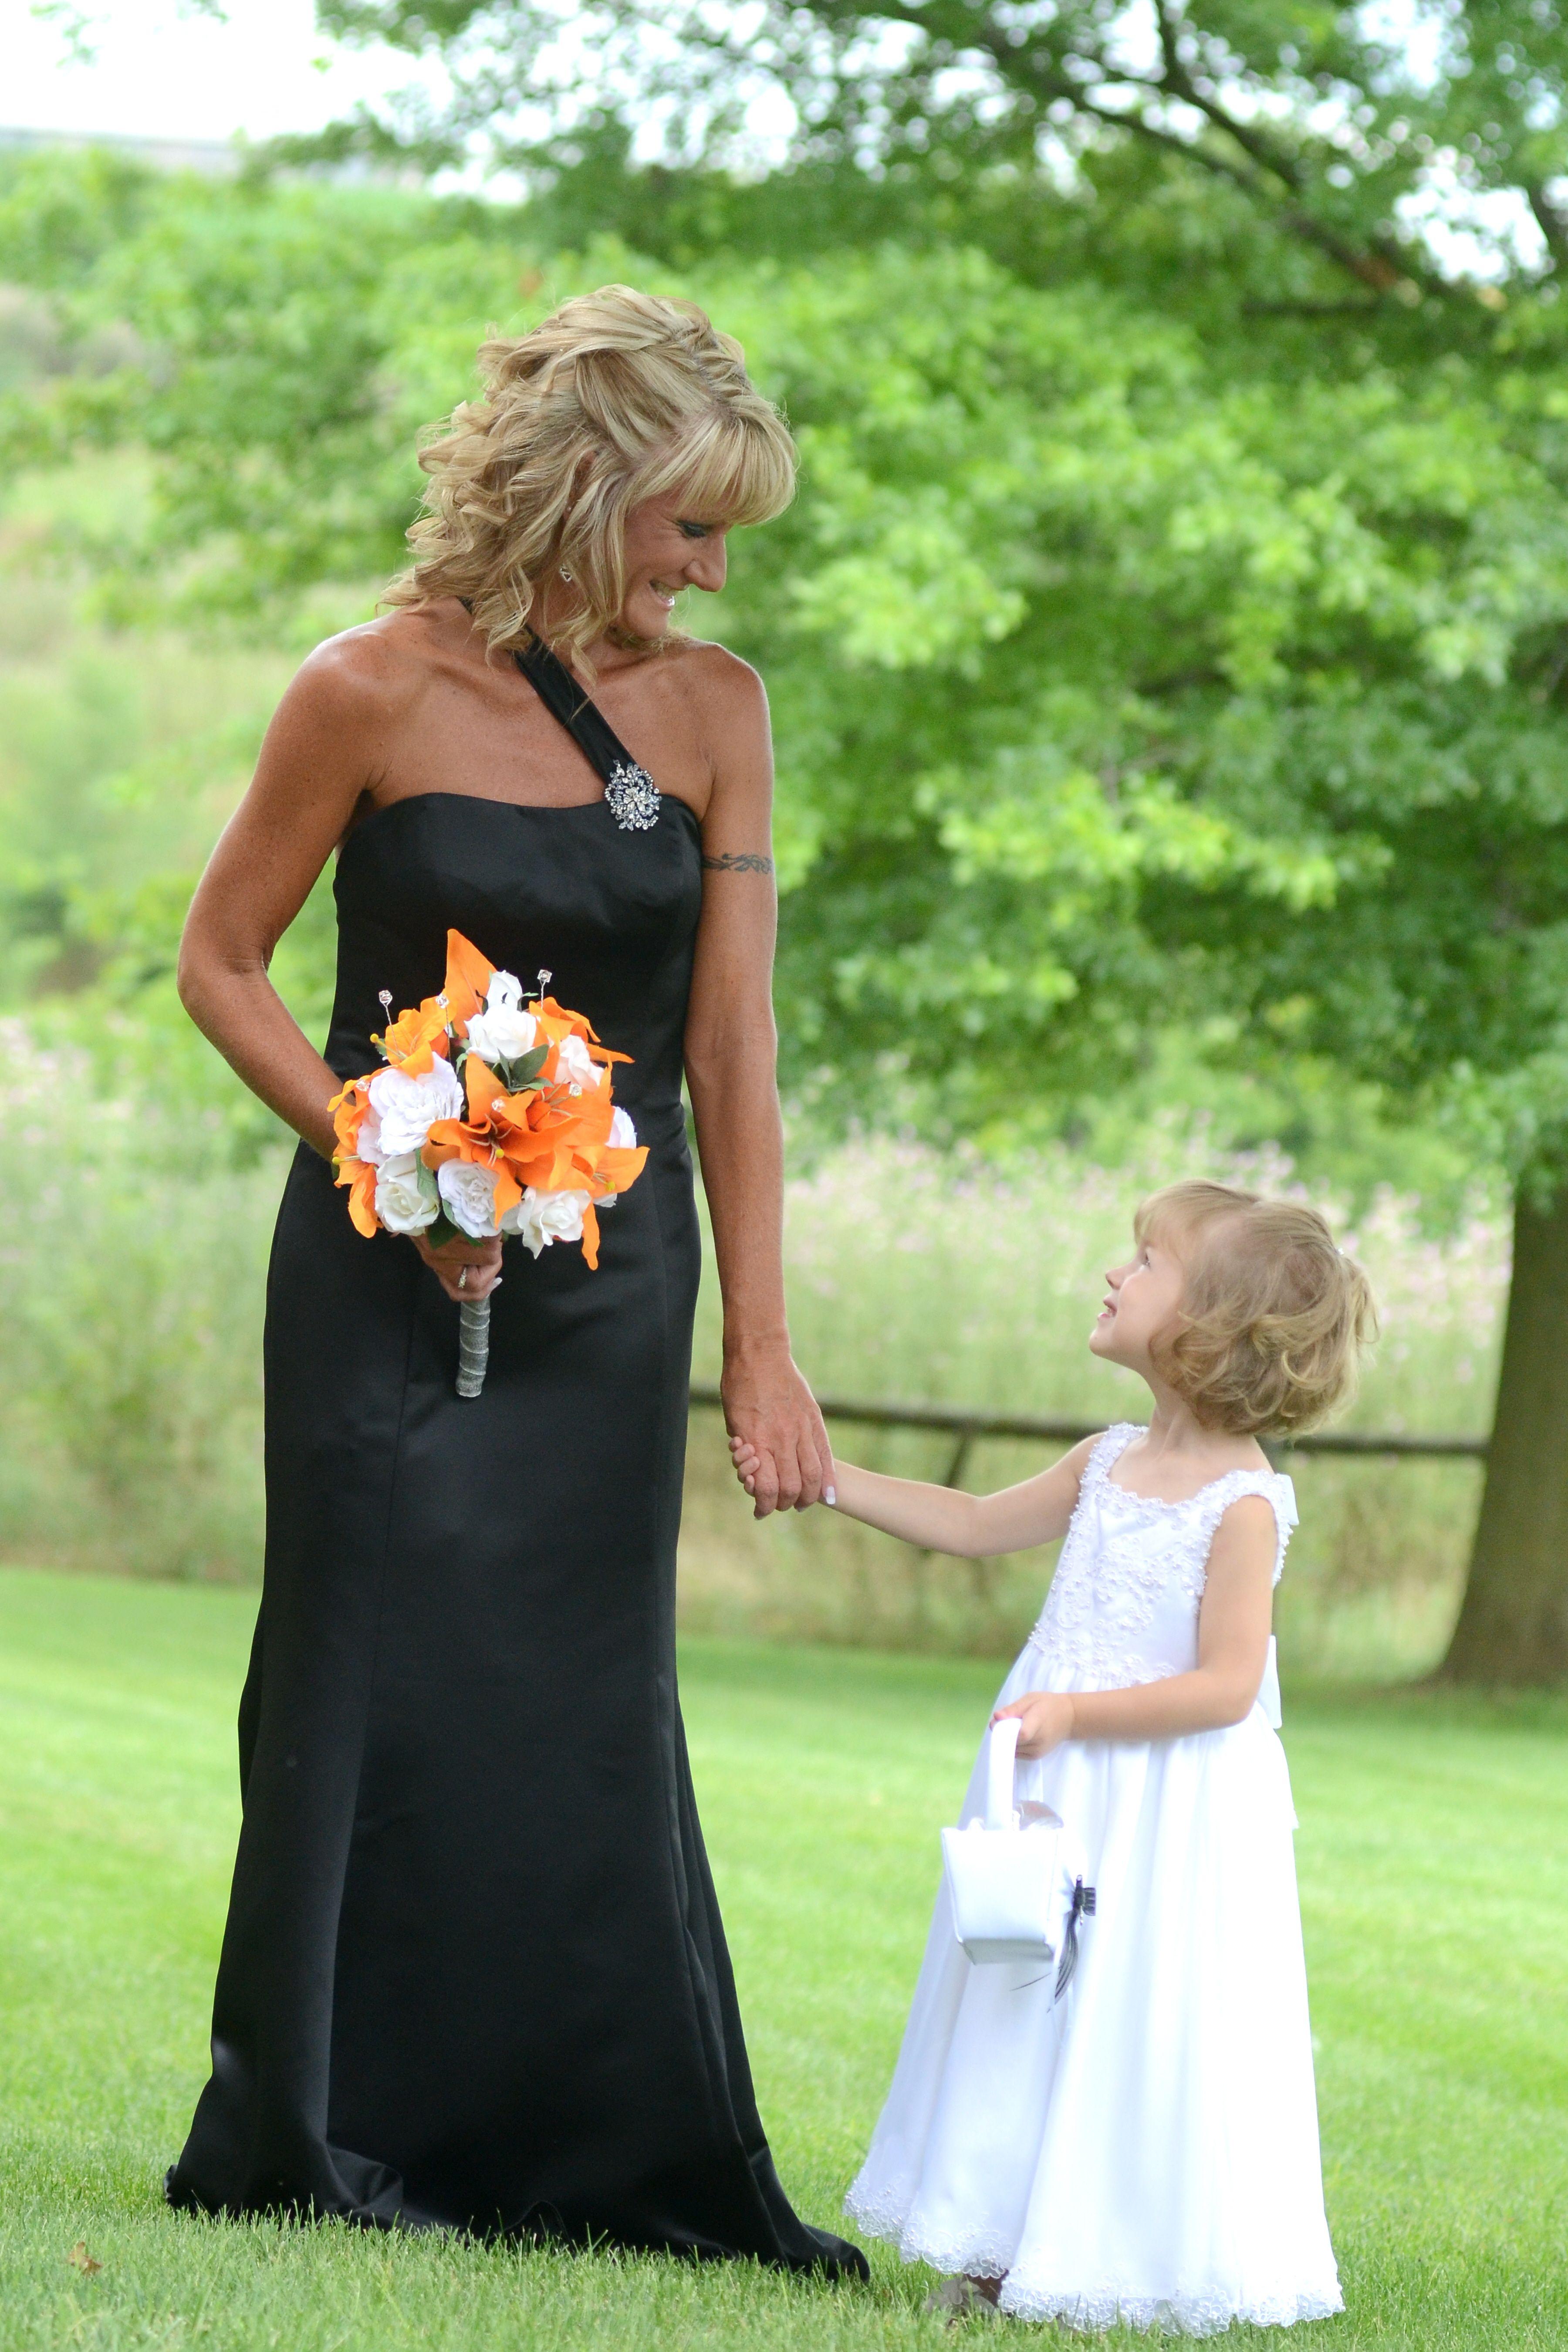 harley davidson wedding myblack wedding dress went awesome with my great niece in white